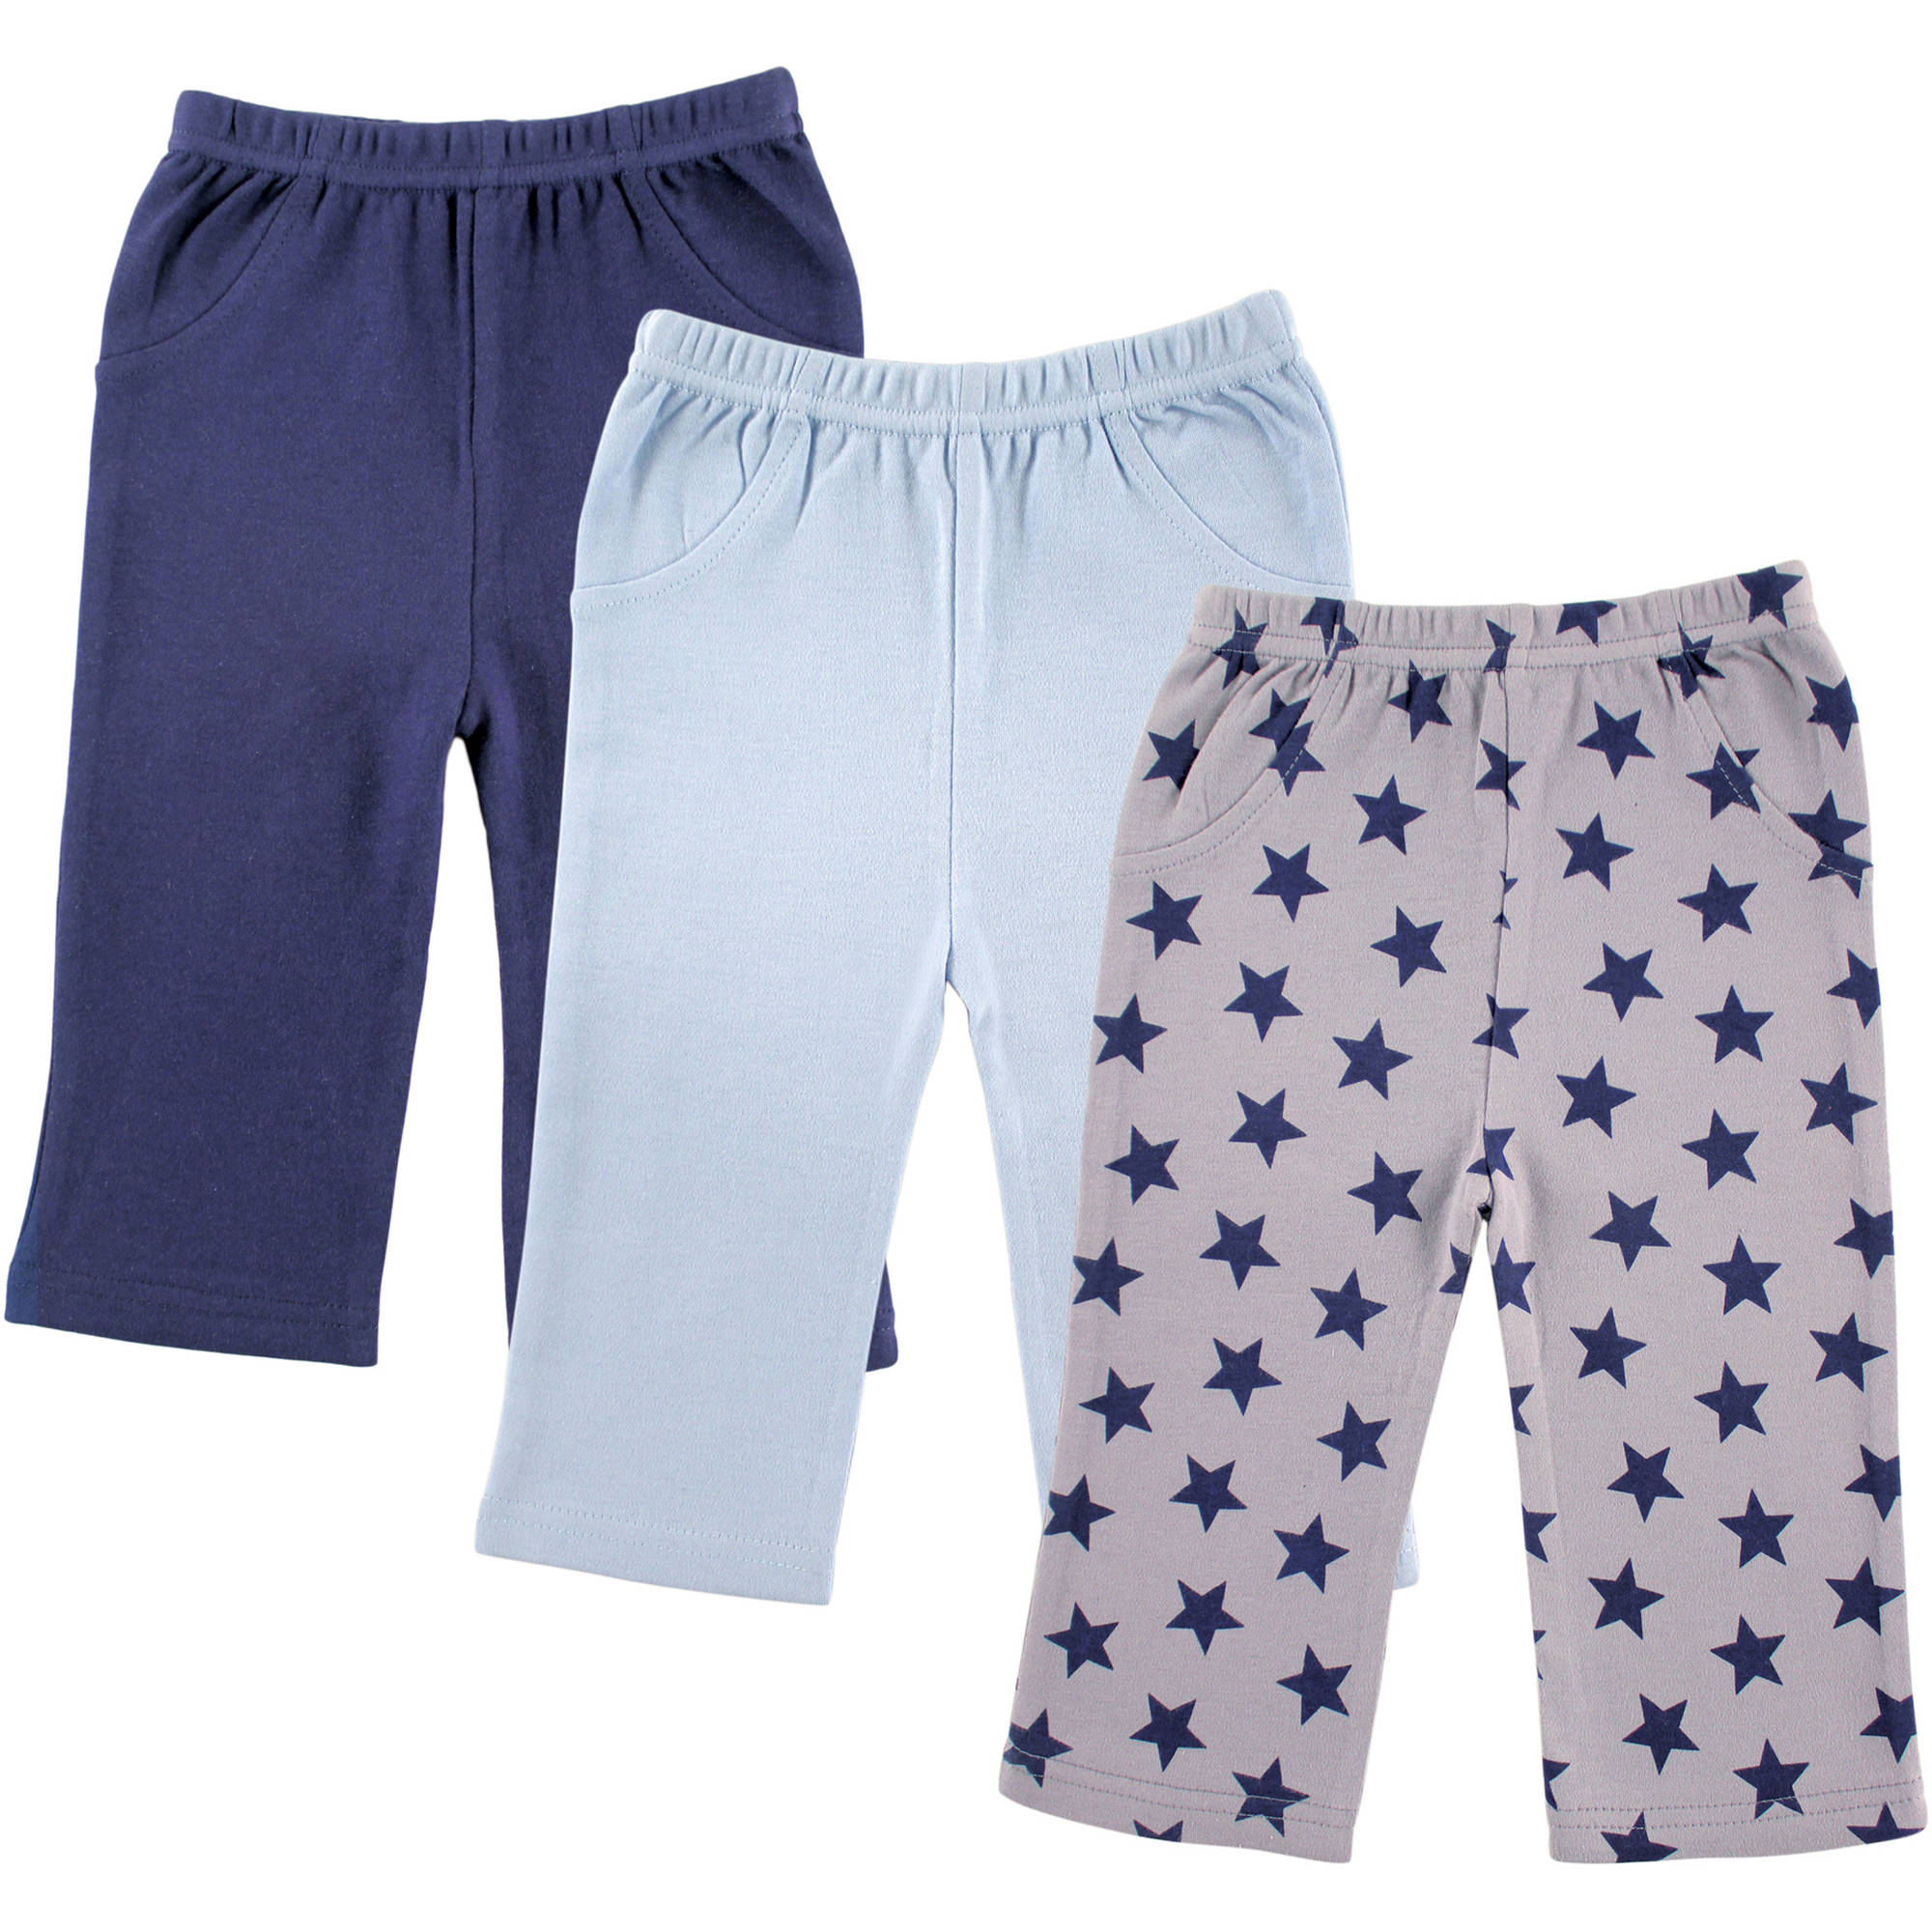 Luvable Friends Newborn Baby Boy 3-Pack Printed Pants, Blue Stars